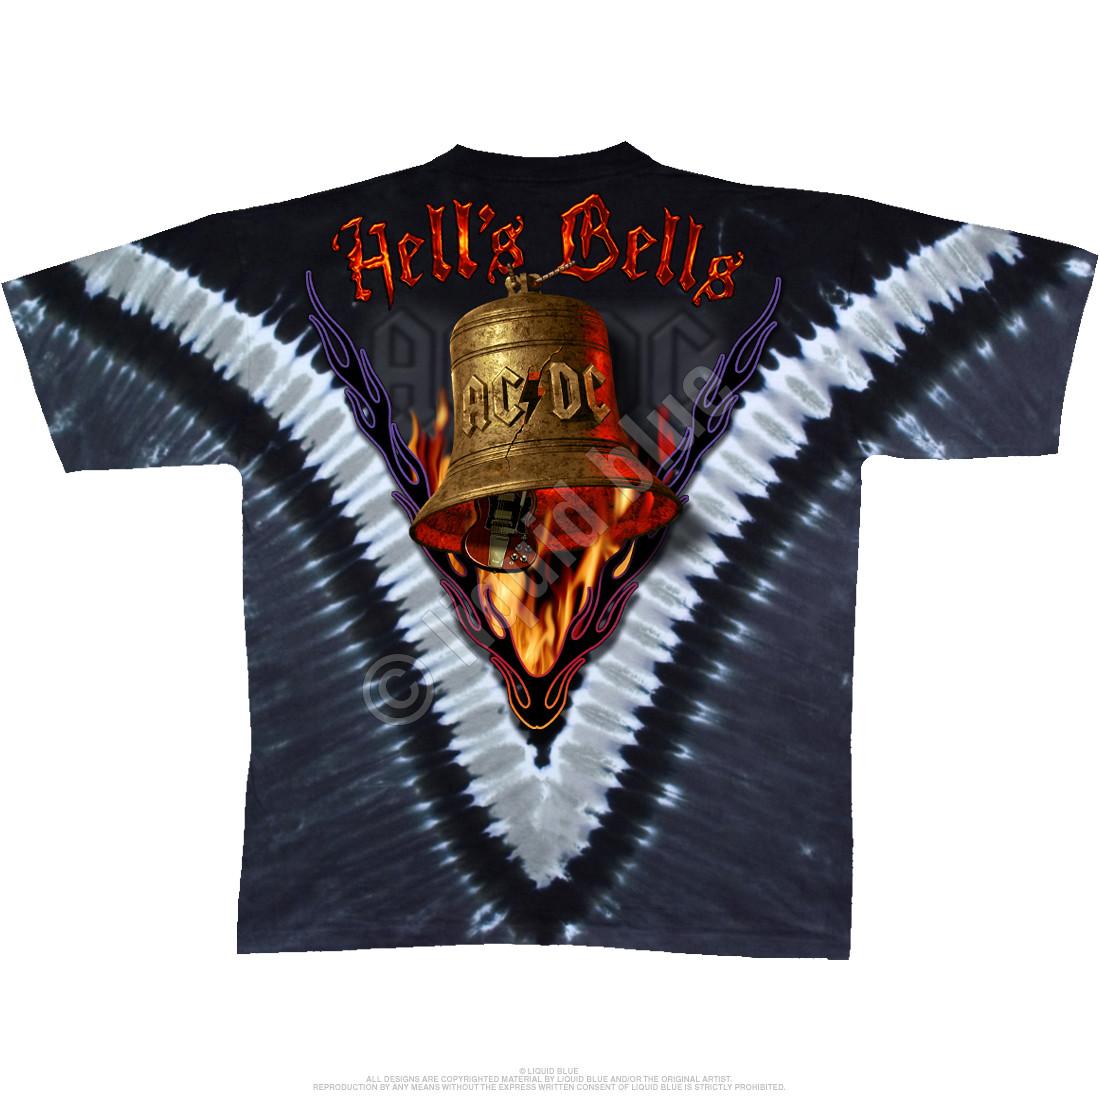 Hells Bells Tie-Dye T-Shirt